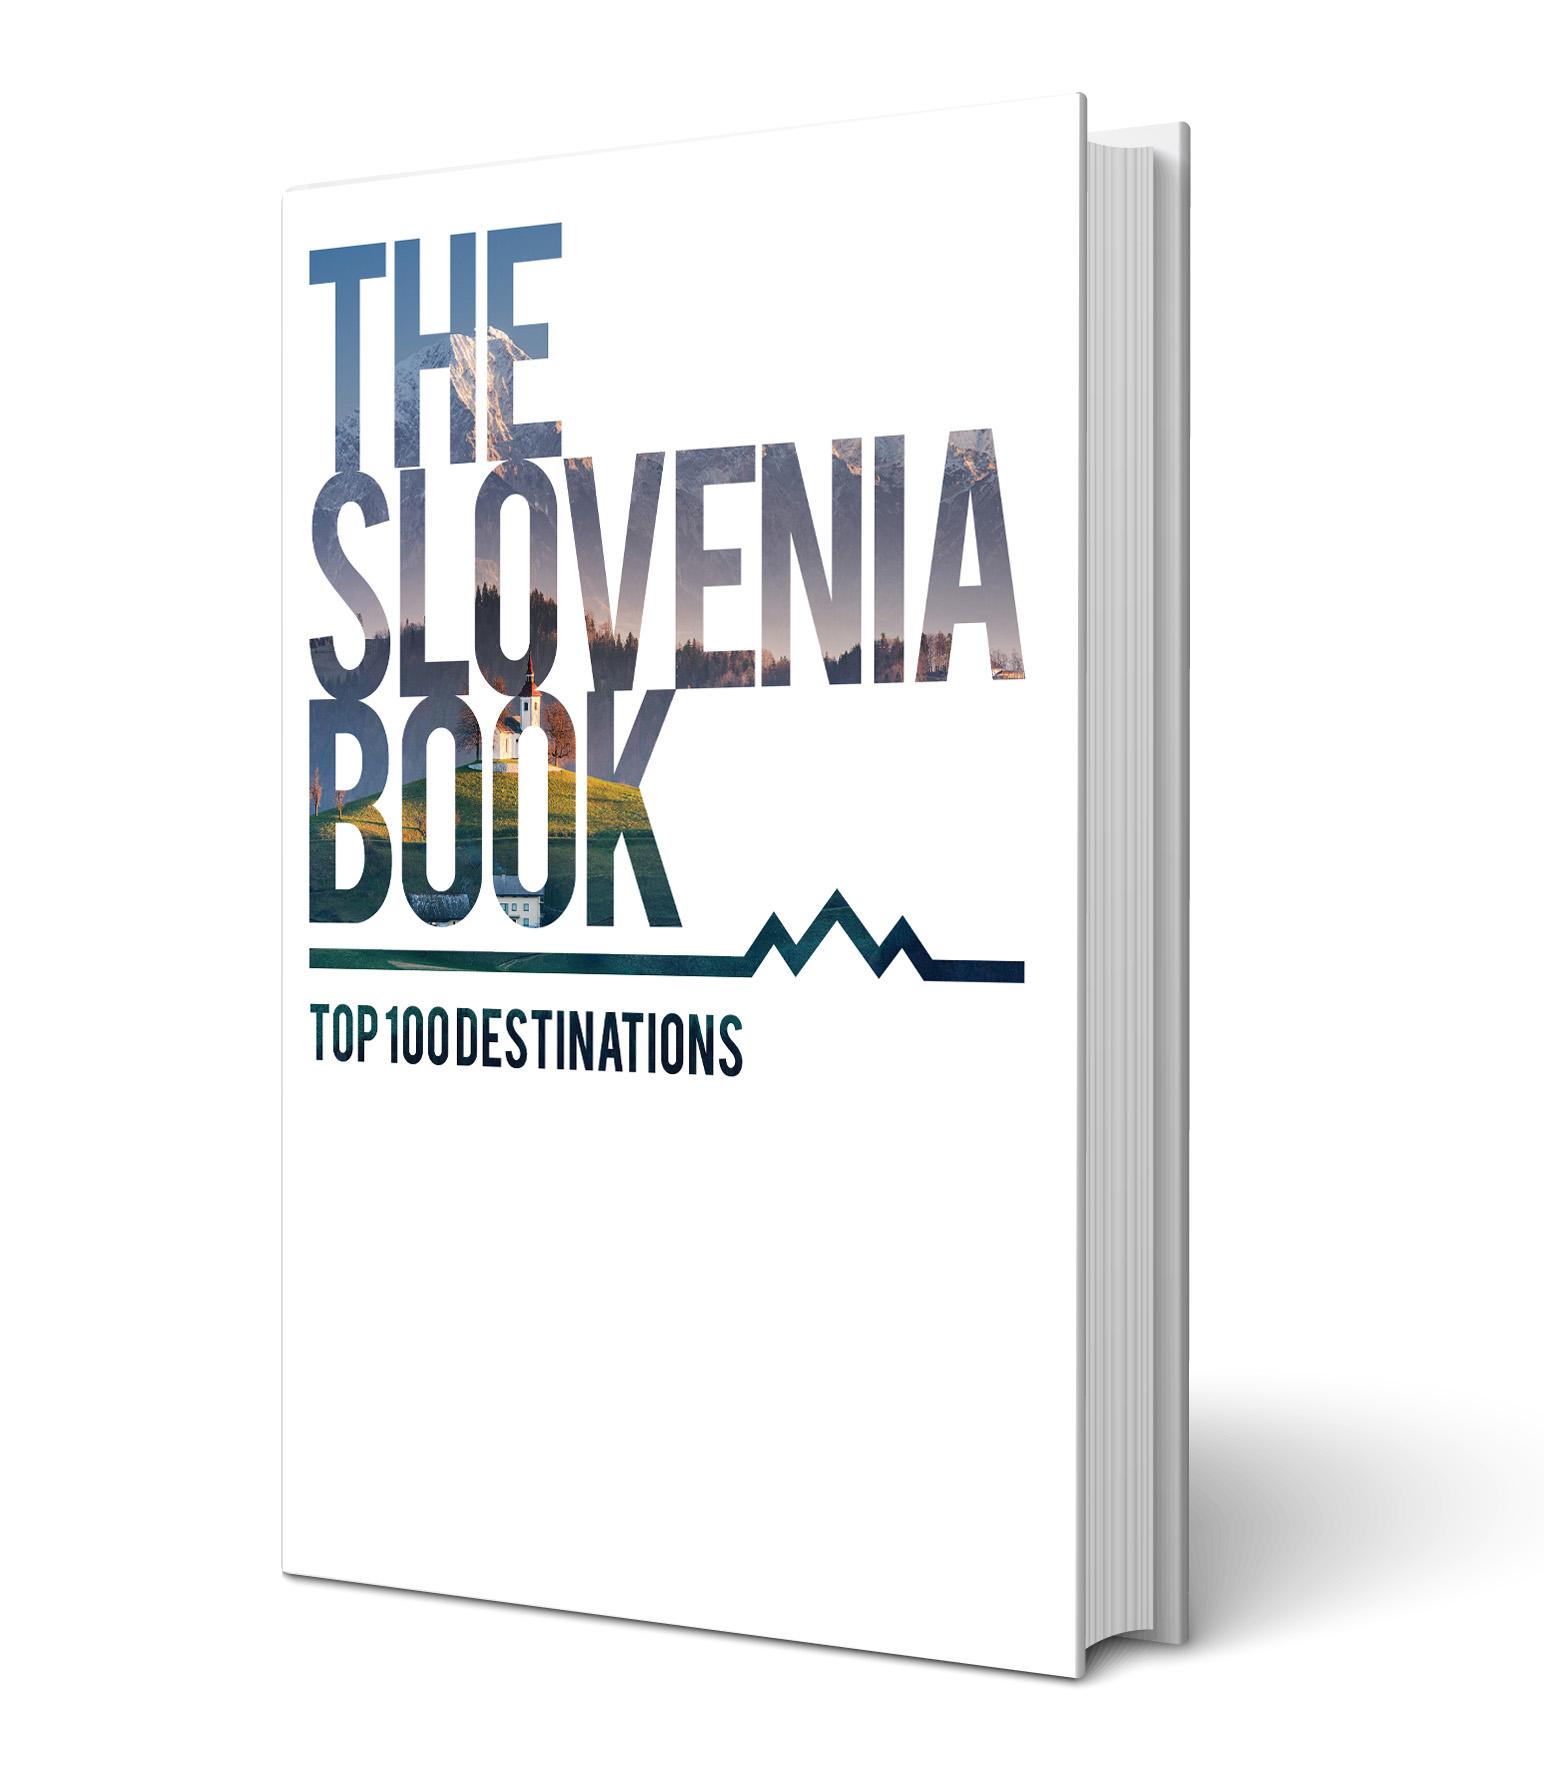 sloveniabook.jpg